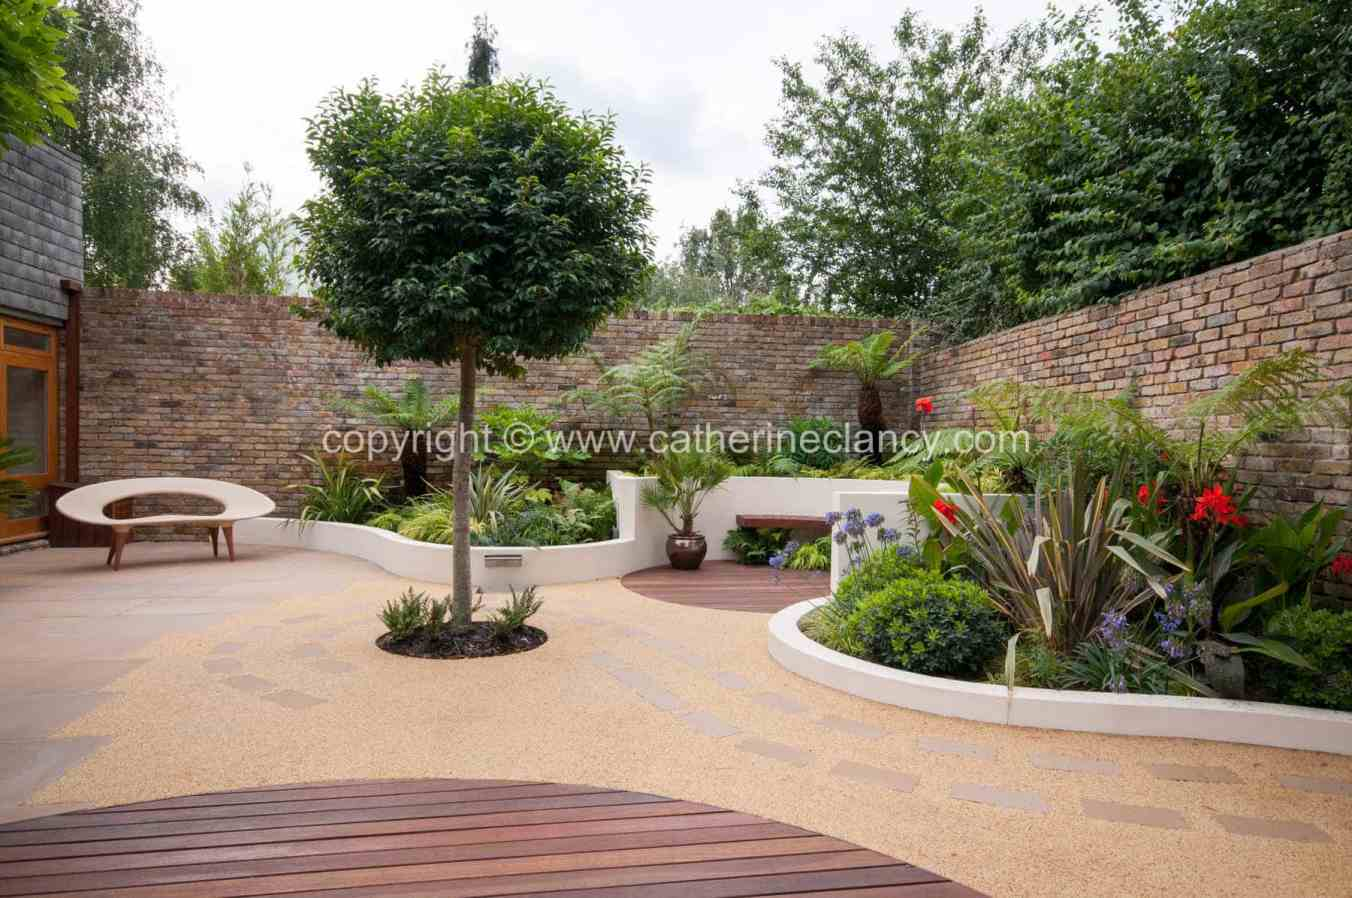 blackheath-courtyard-3